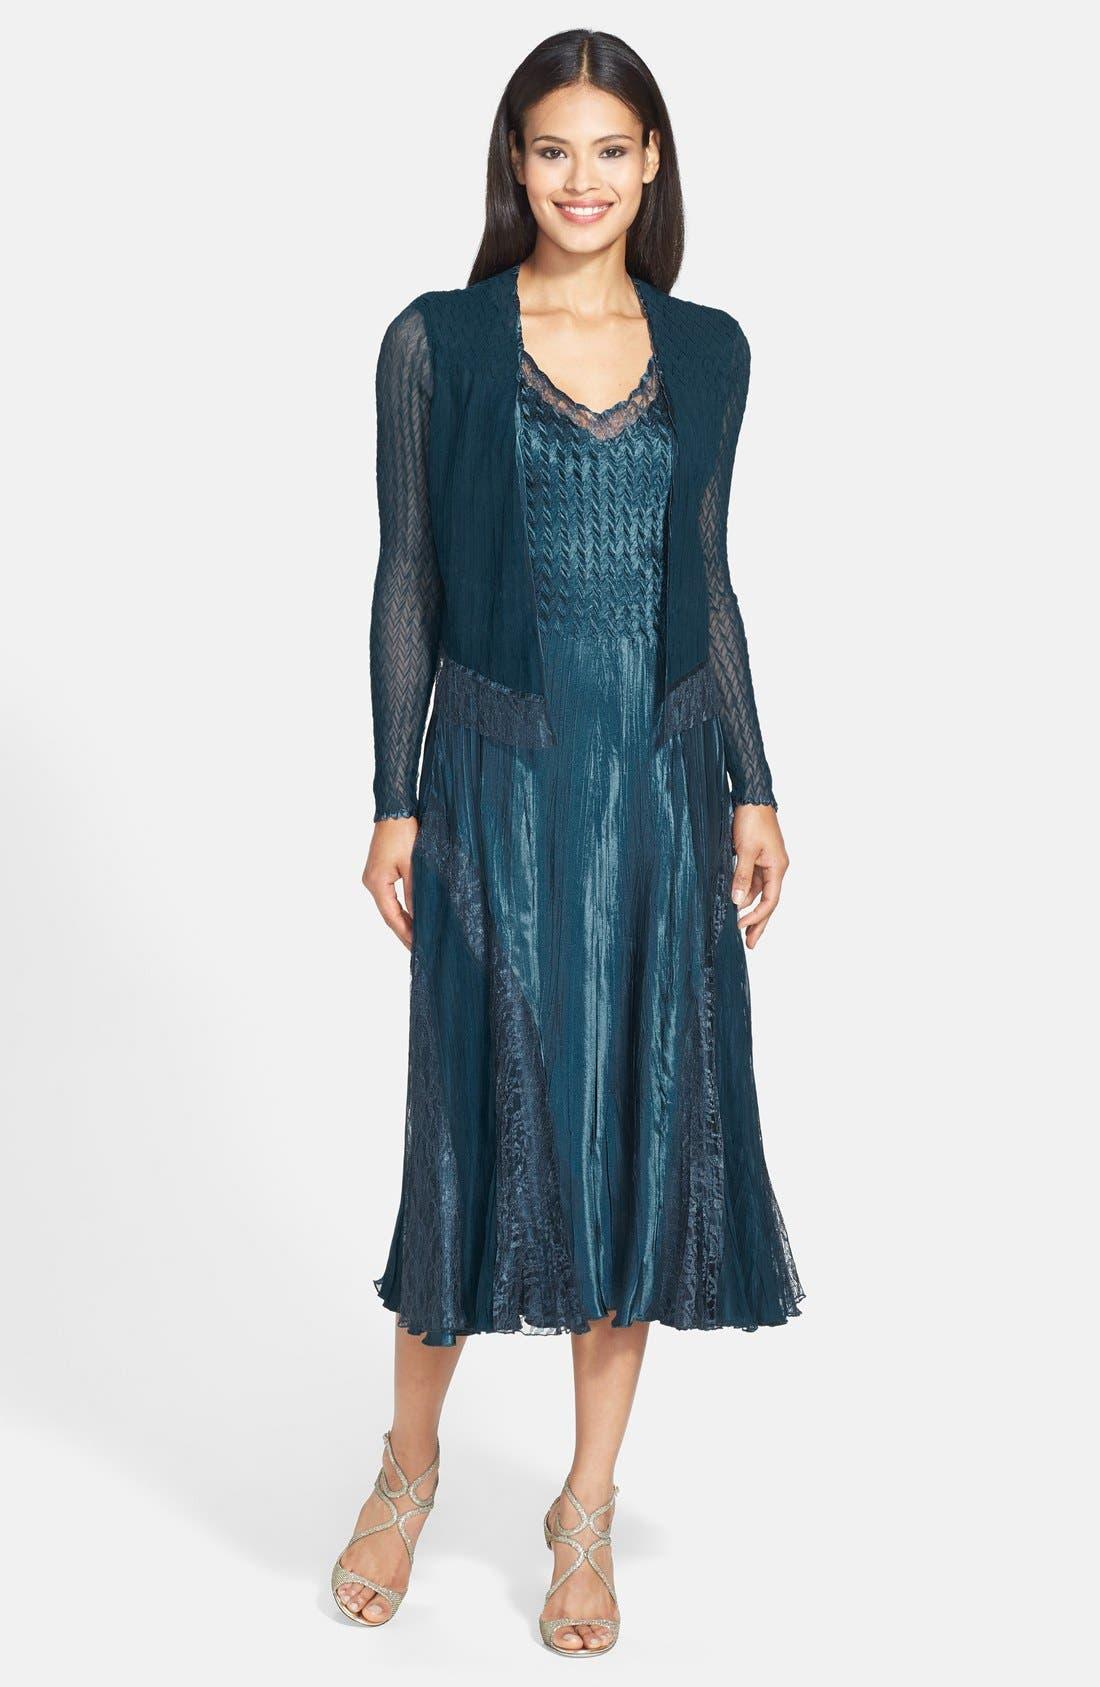 Alternate Image 1 Selected - Komarov Lace Trim Charmeuse Dress & Jacket